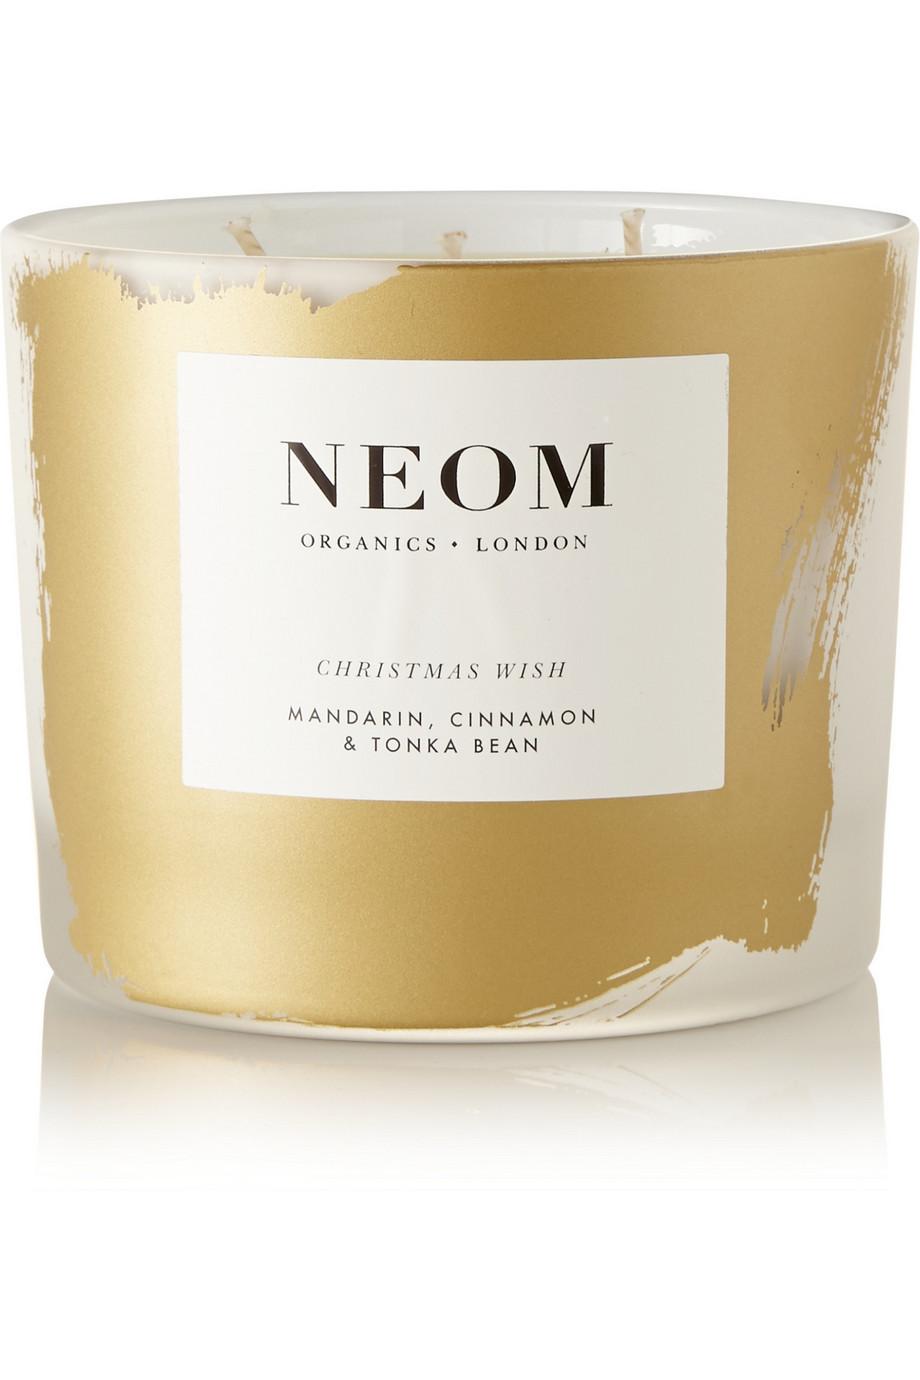 Neom Organics Christmas Wish Mandarin, Cinnamon and Tonka Bean Scented Candle, 330g